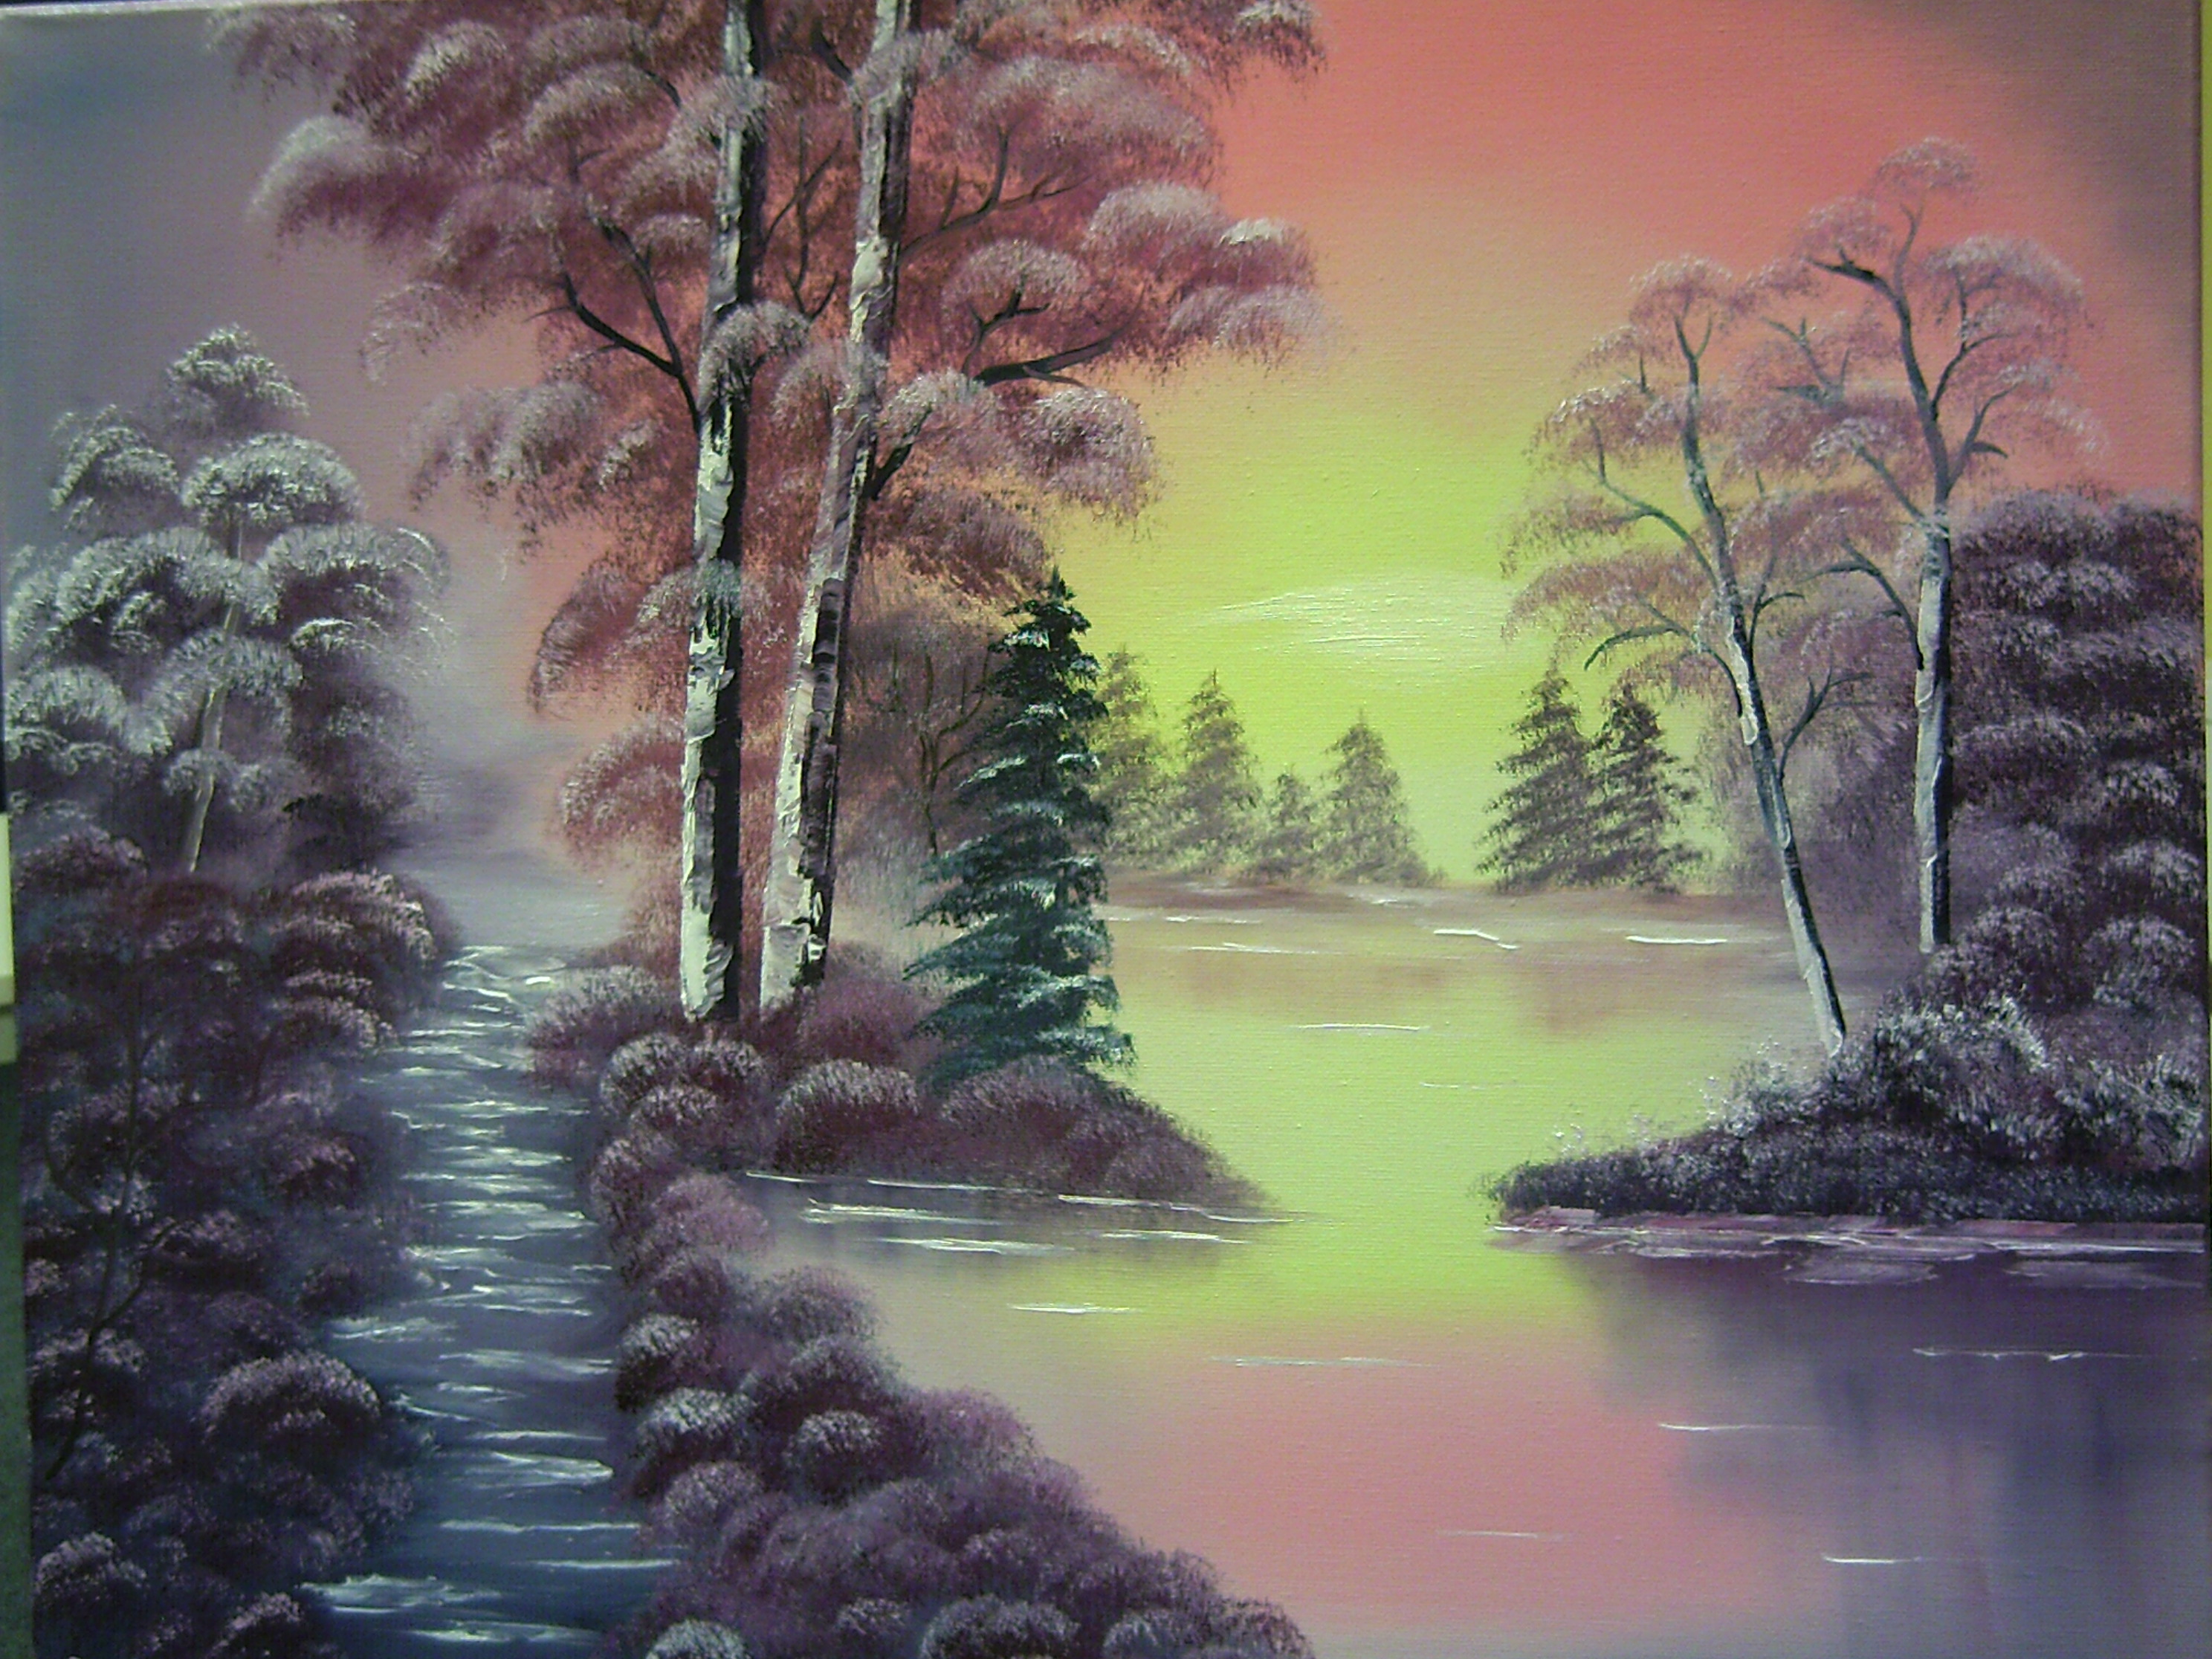 Alaska >> Antonie's Malerei: Landschaften nach Bob Ross